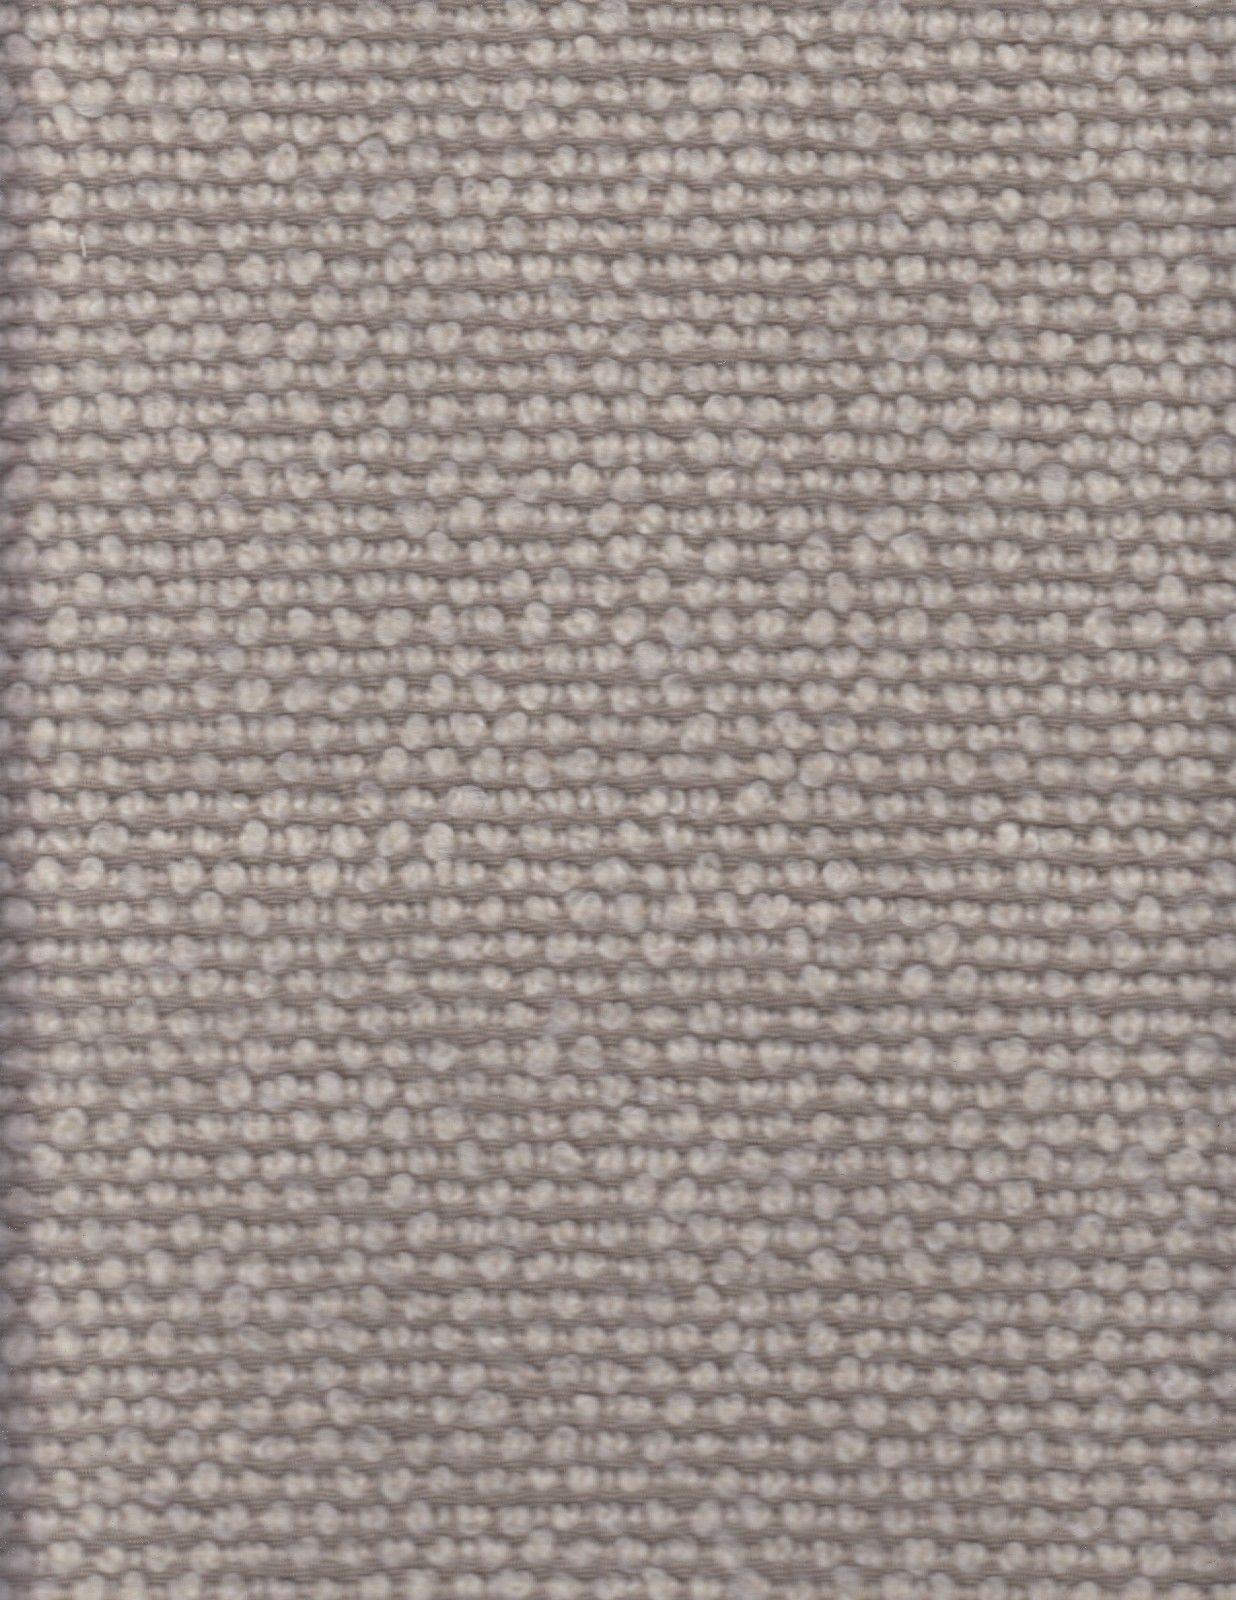 10.5 yds Bernhardt Upholstery Fabric MCM Muse Nubby Wool 3454-002 Dune CU